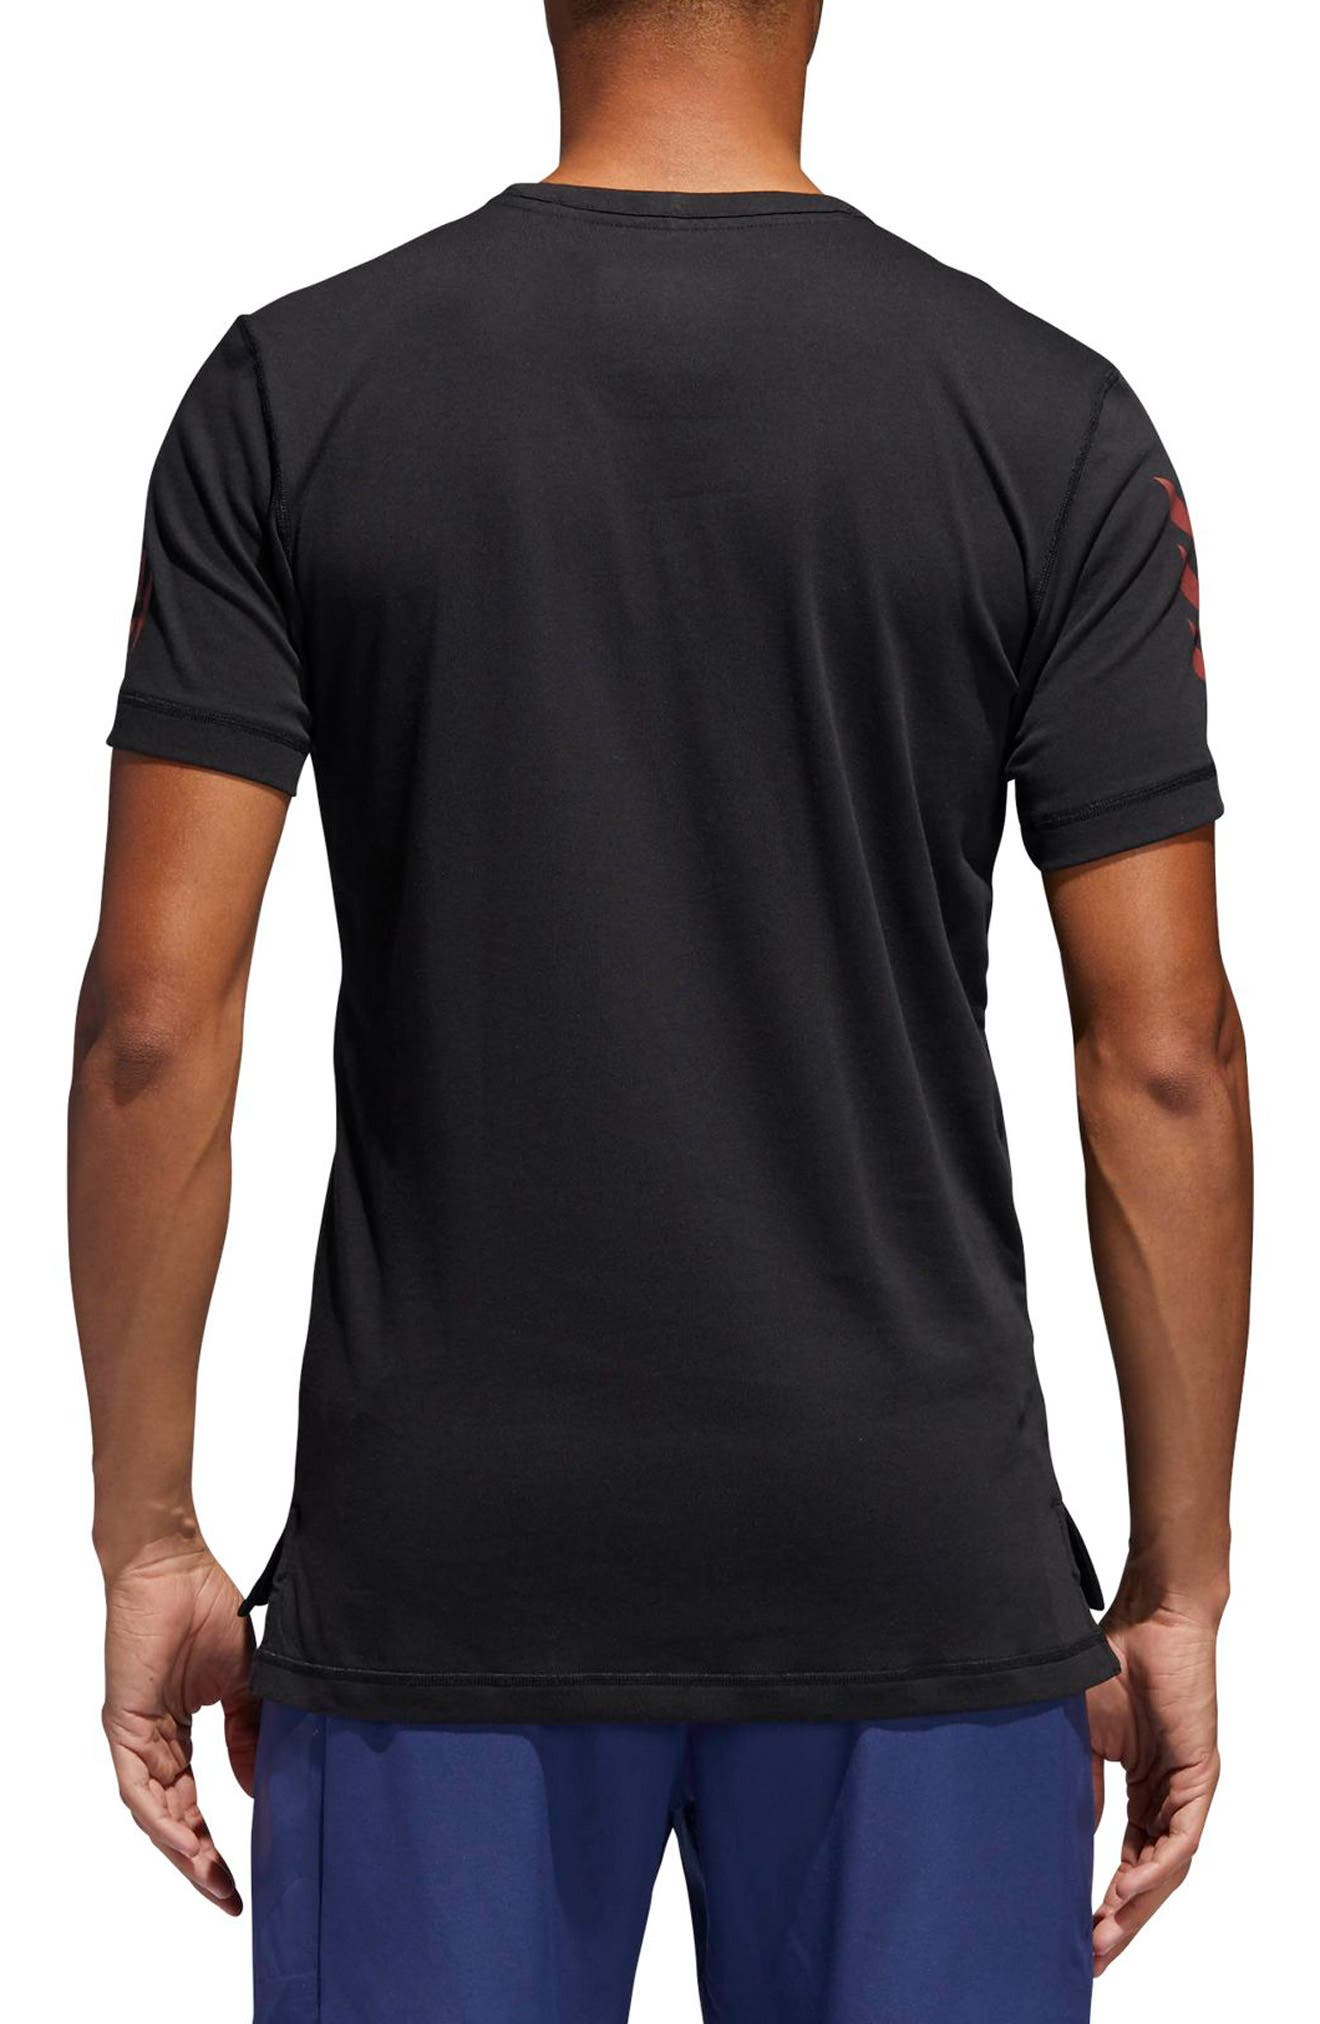 Harden Brand Slogan T-Shirt,                             Alternate thumbnail 2, color,                             Black